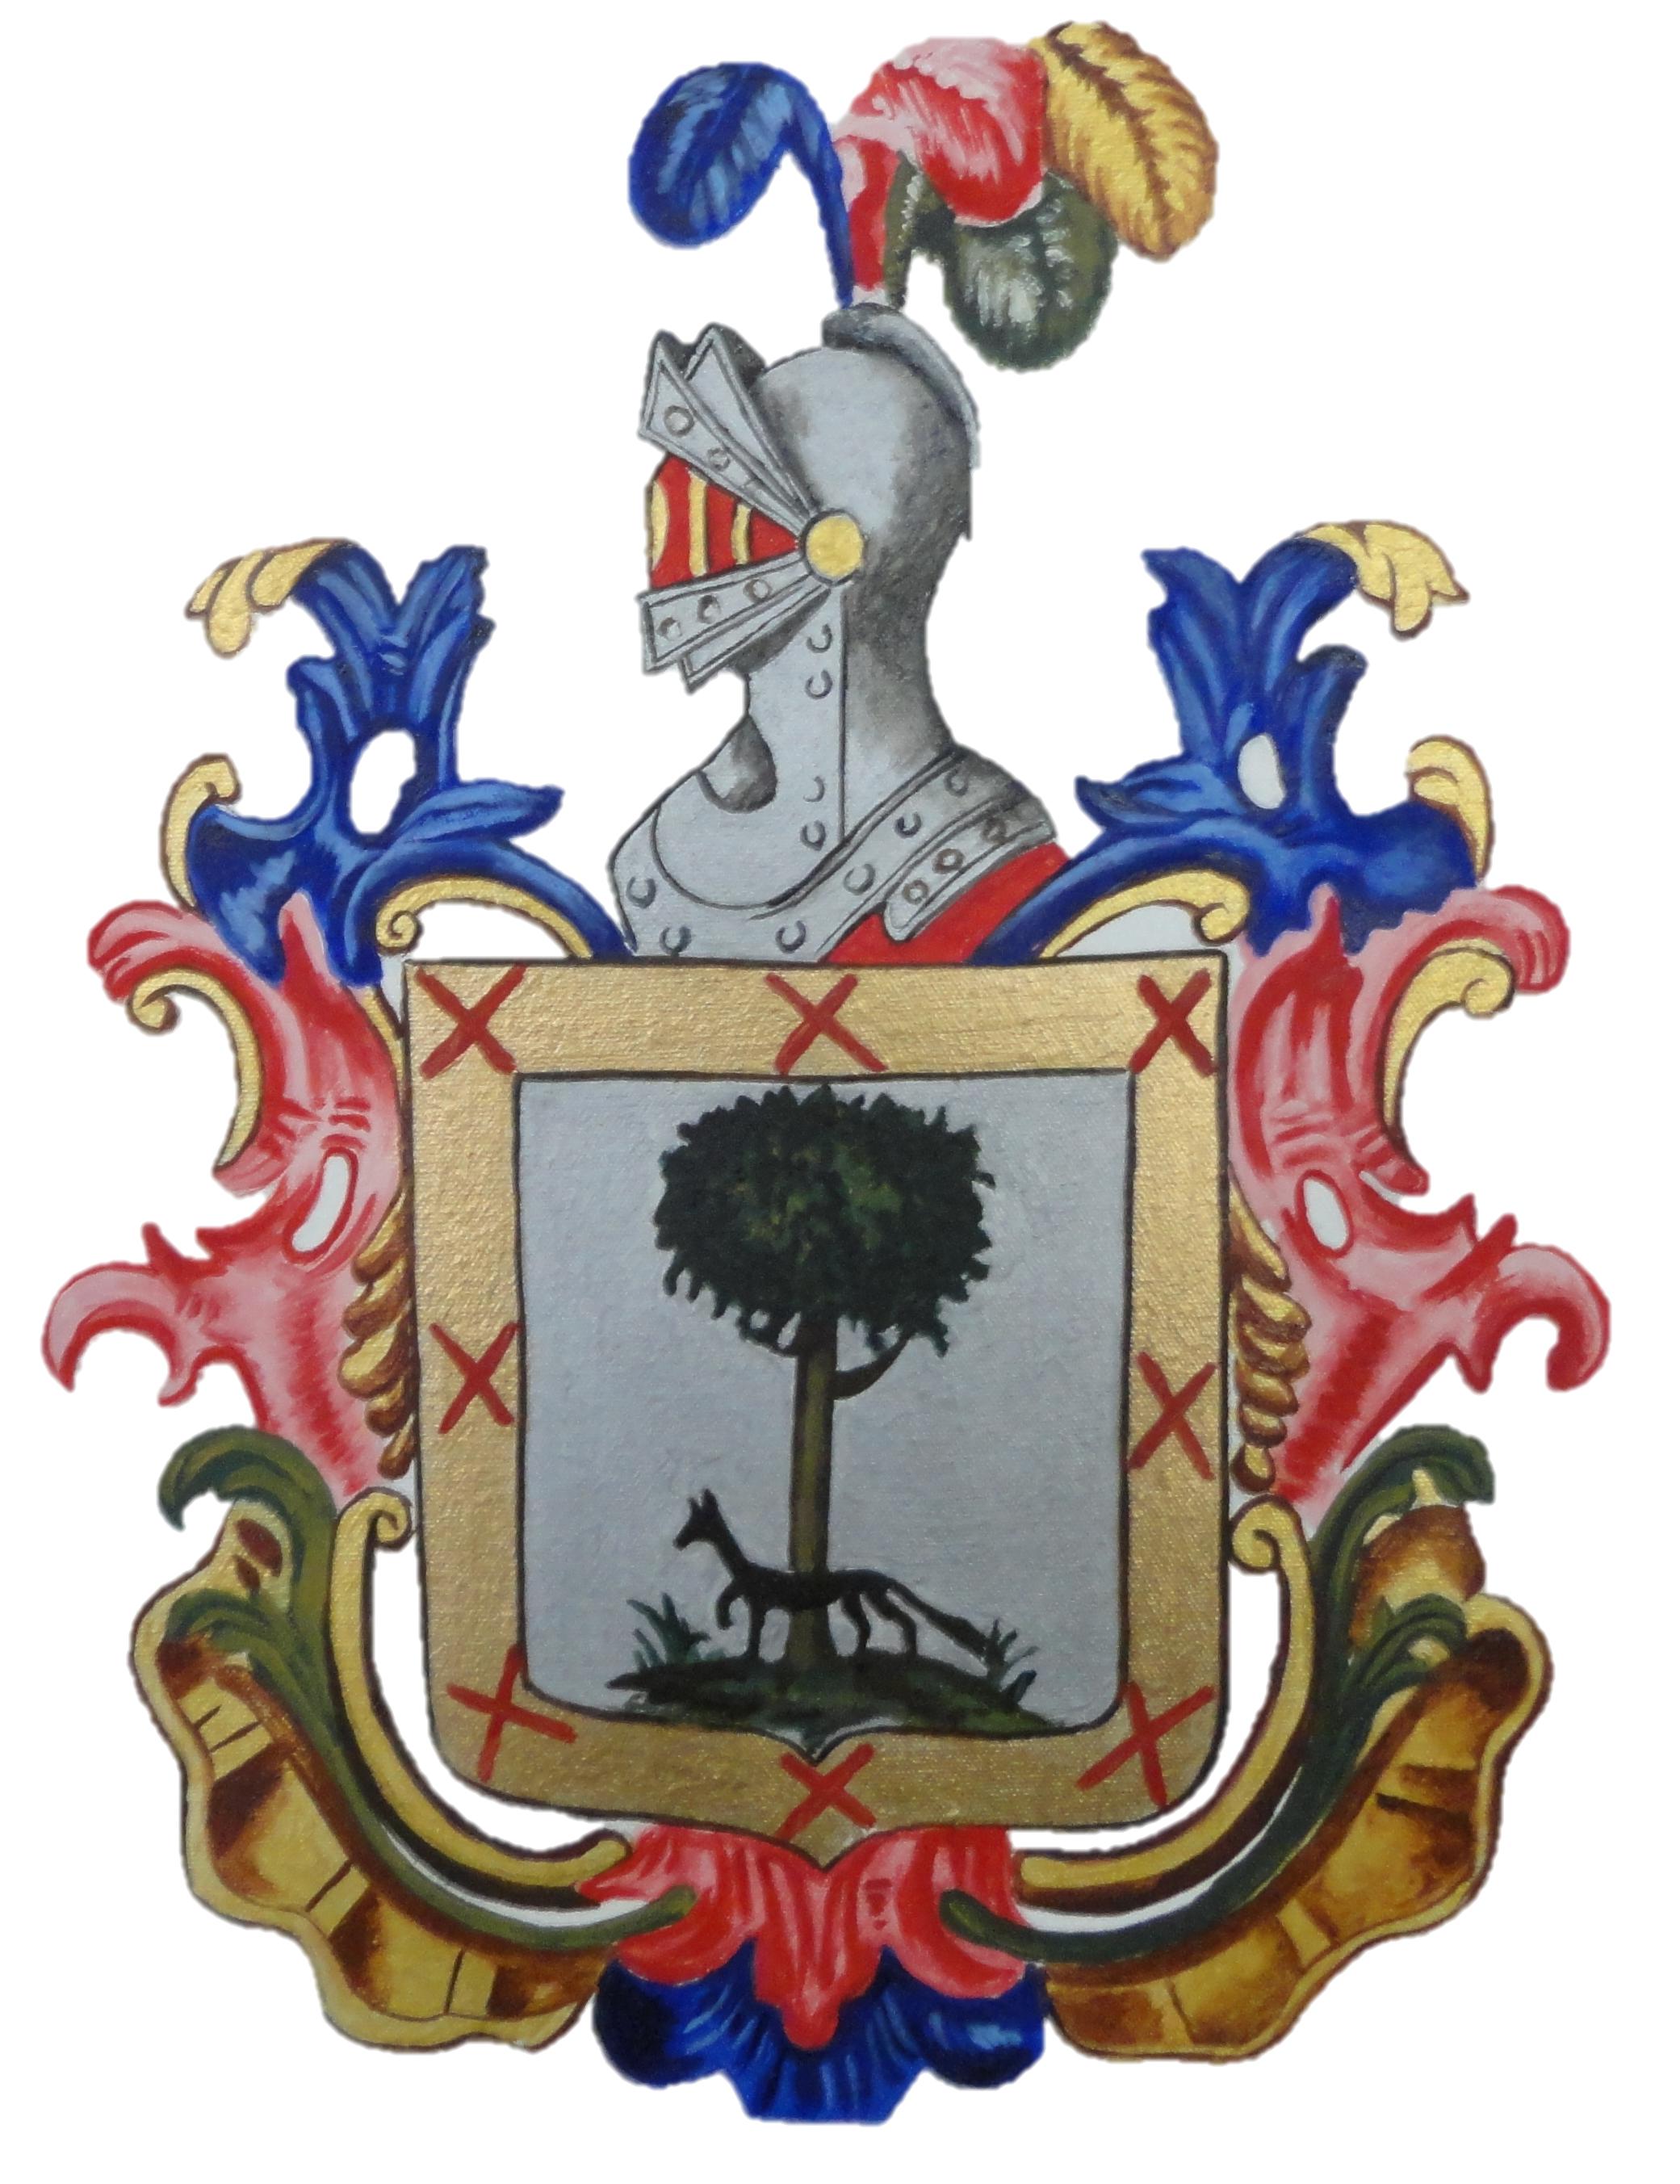 Escudo Amiga de la Obrera